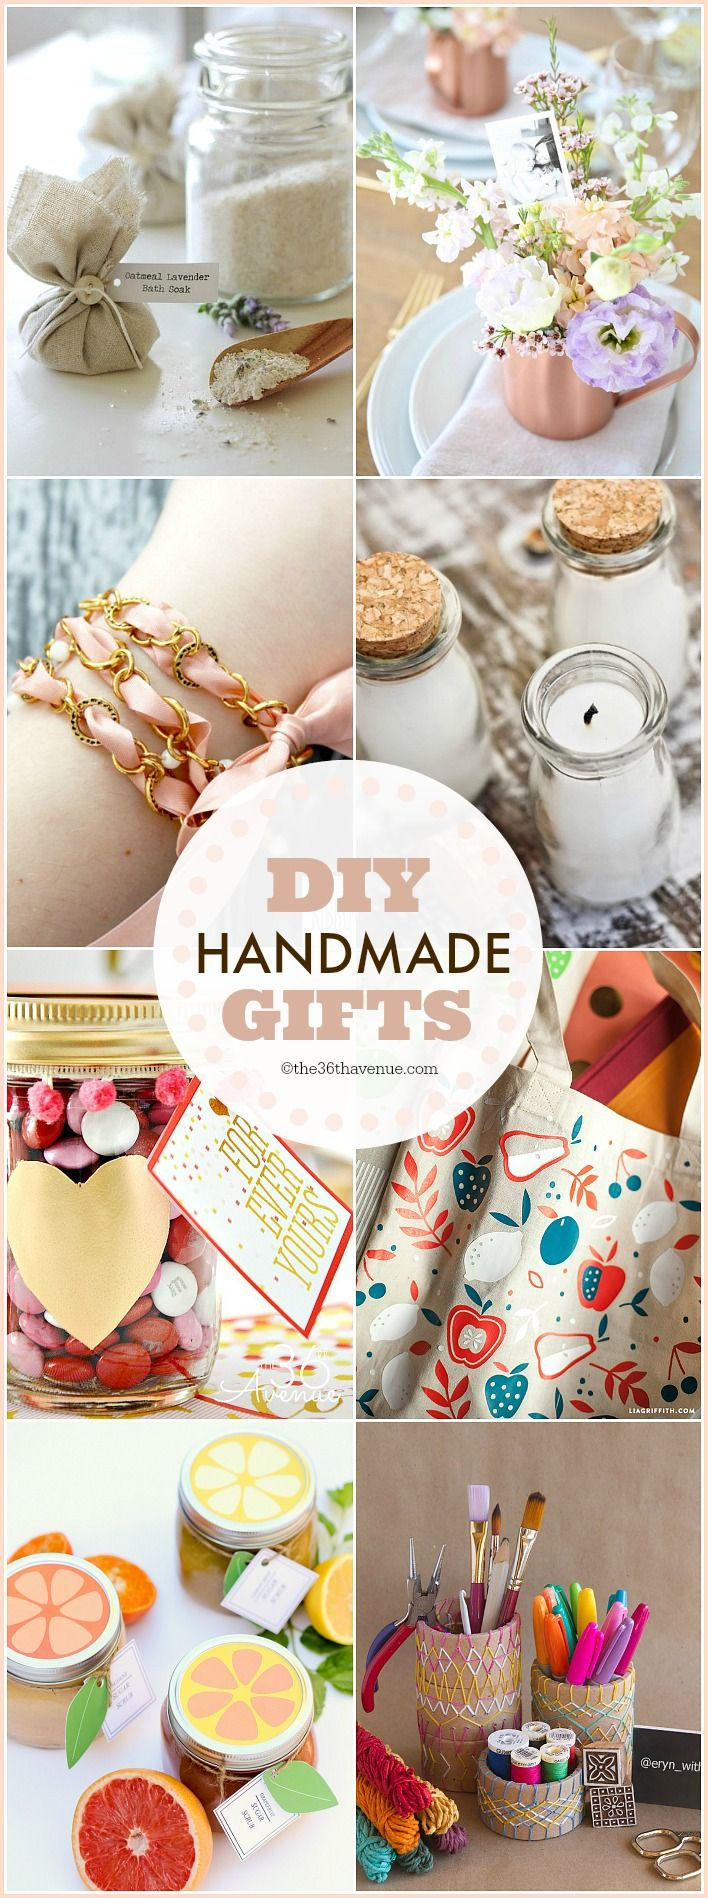 100 Handmade Gifts Under Five Dollars Kawaii Diy And